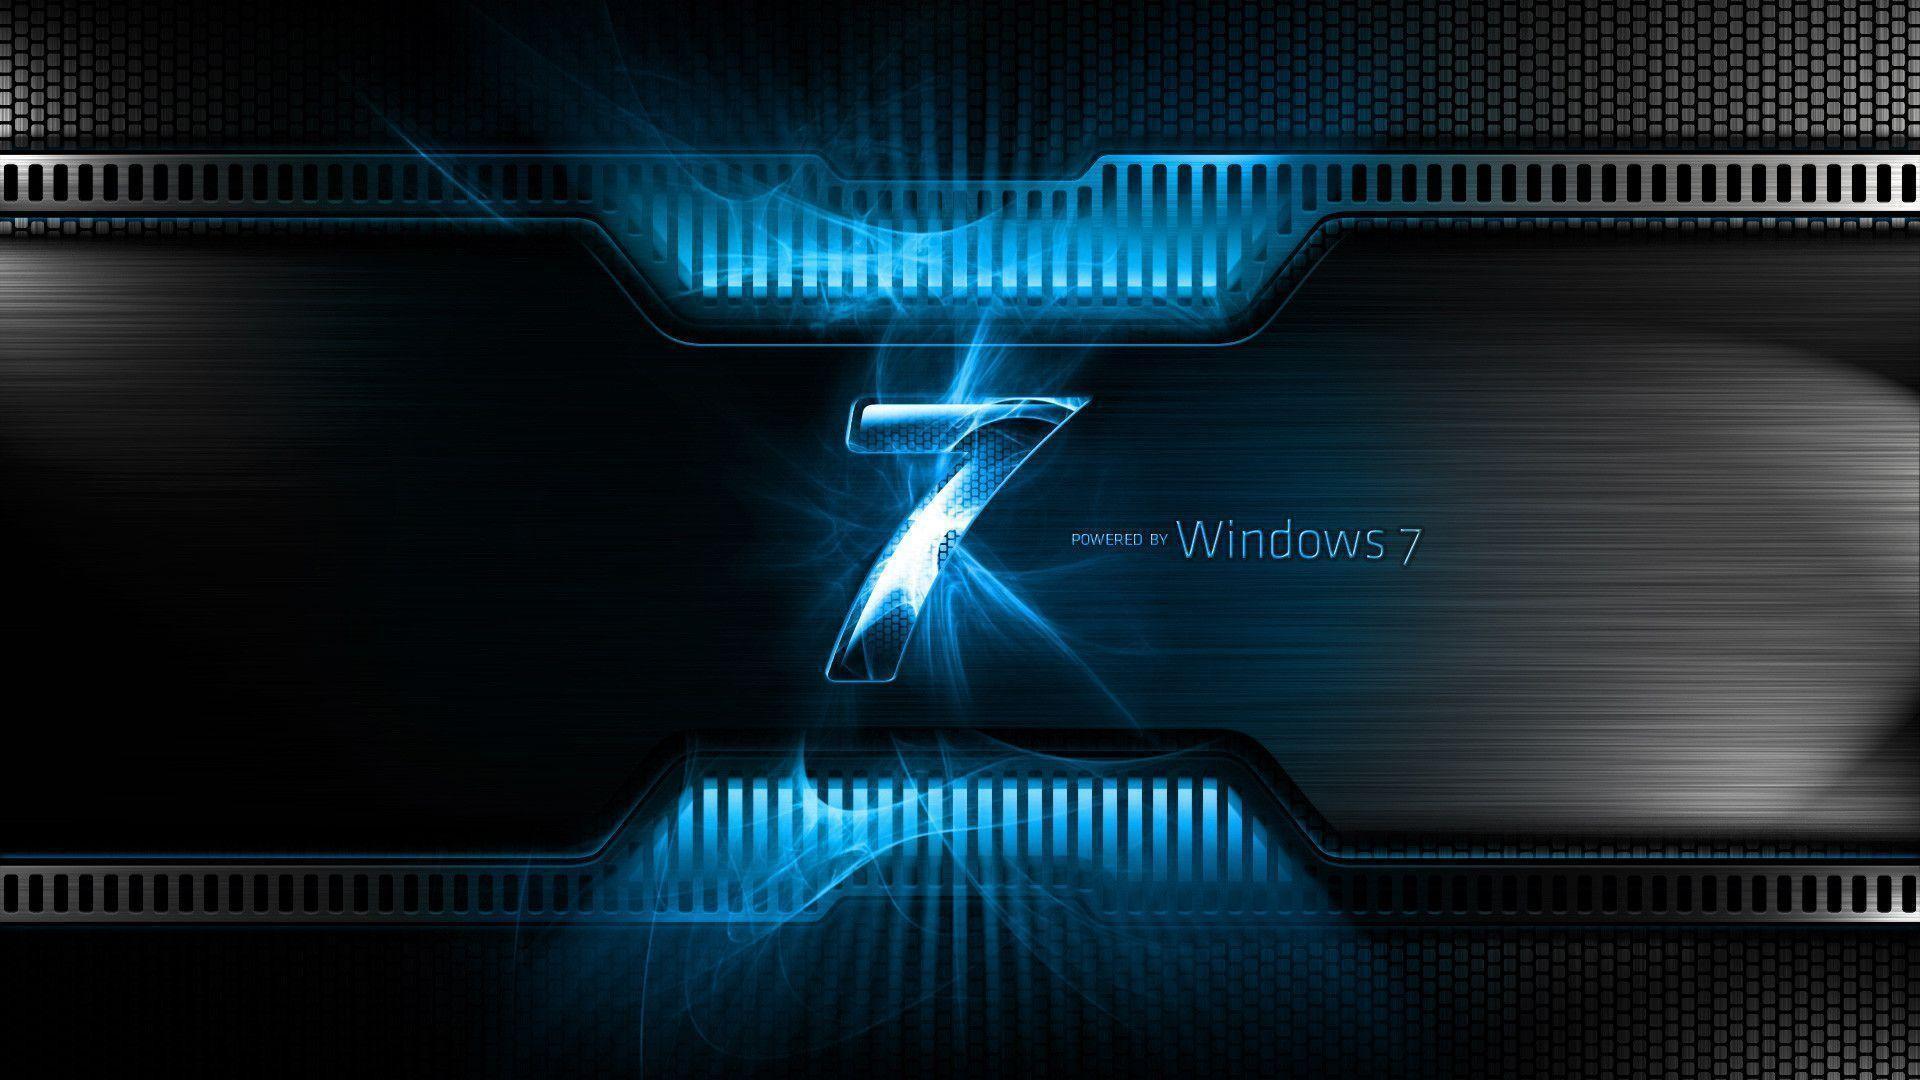 Windows 7 Wallpapers Hd New Free Download Wall #5557 Wallpaper .